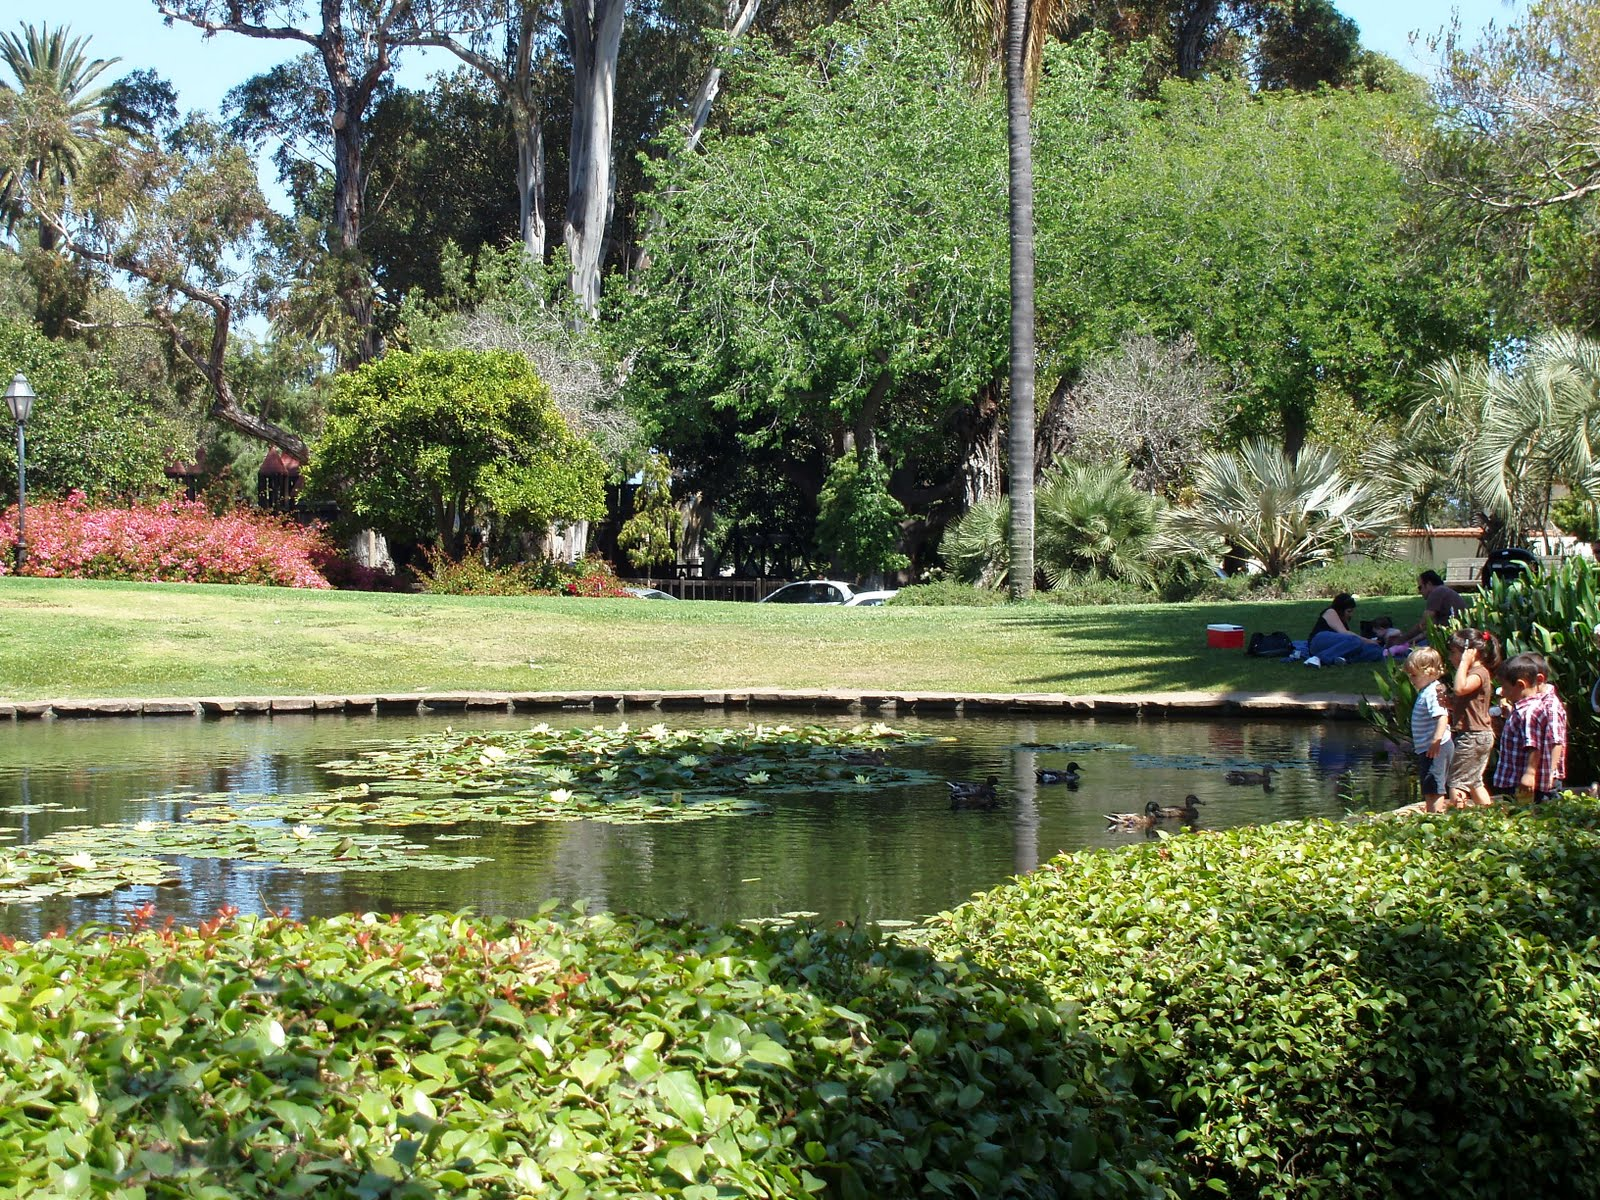 santa barbara sights and events alice 39 s garden. Black Bedroom Furniture Sets. Home Design Ideas